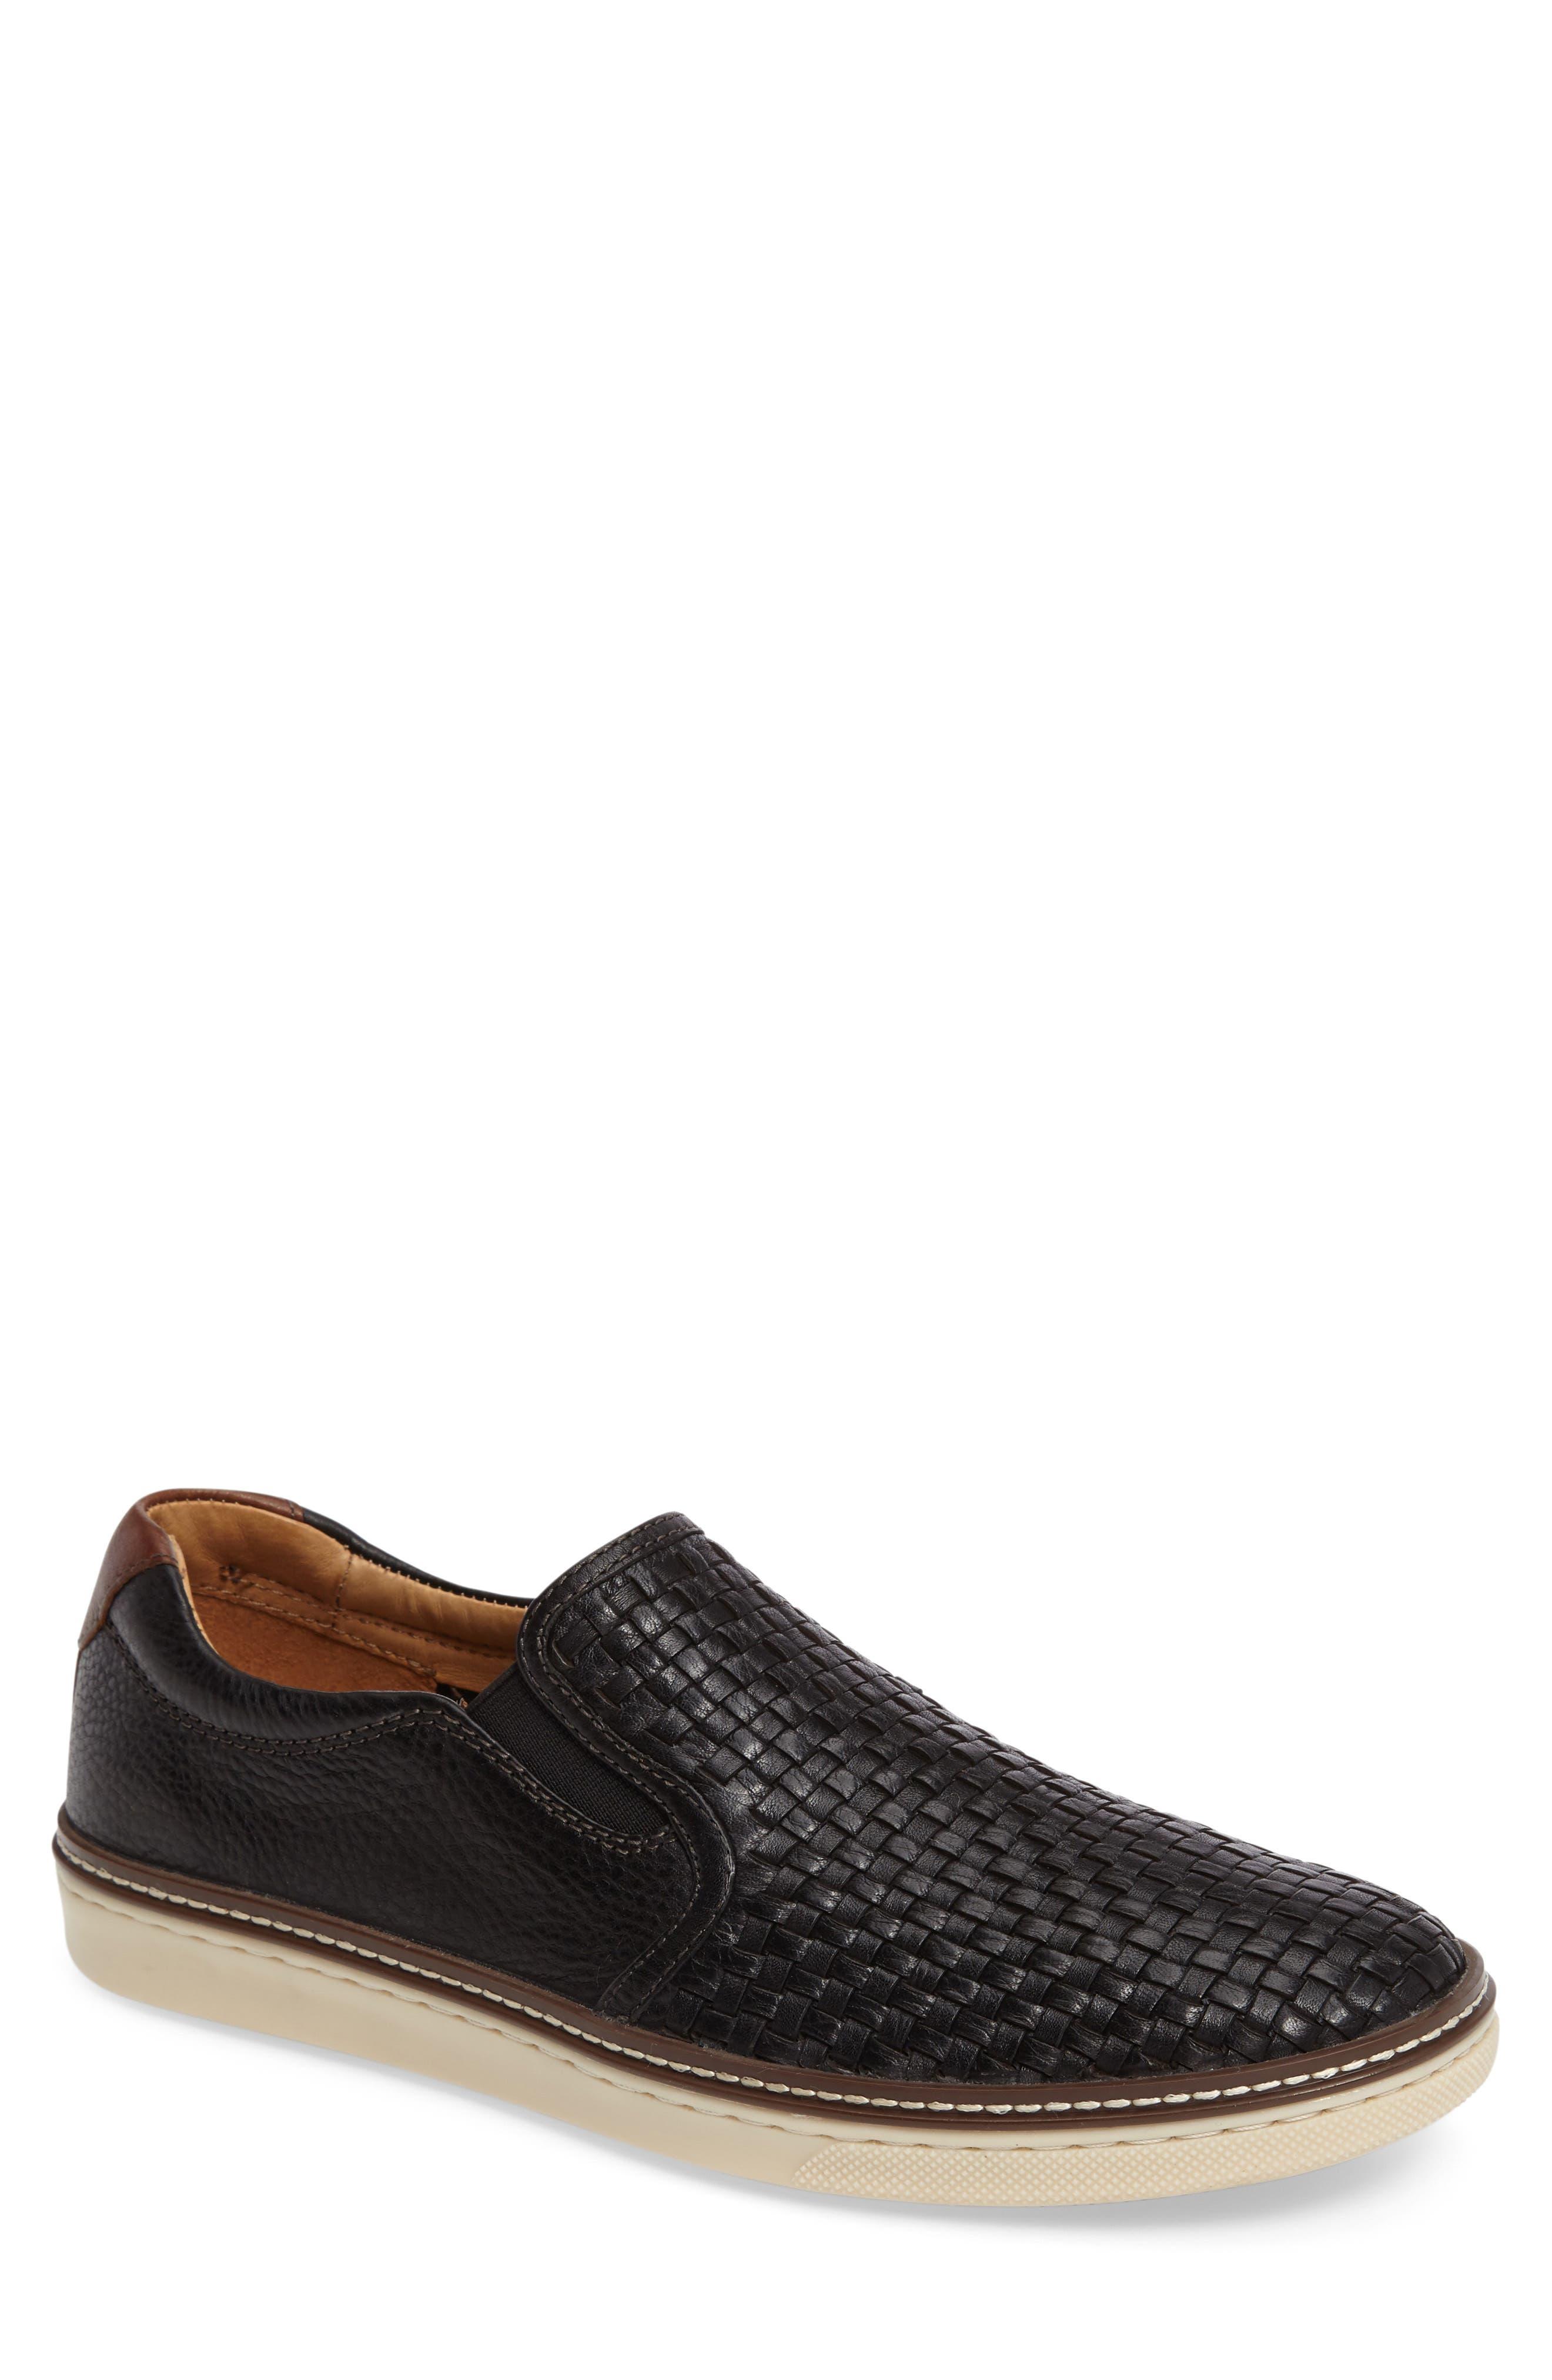 McGuffey Woven Slip-On Sneaker,                             Main thumbnail 1, color,                             BLACK LEATHER